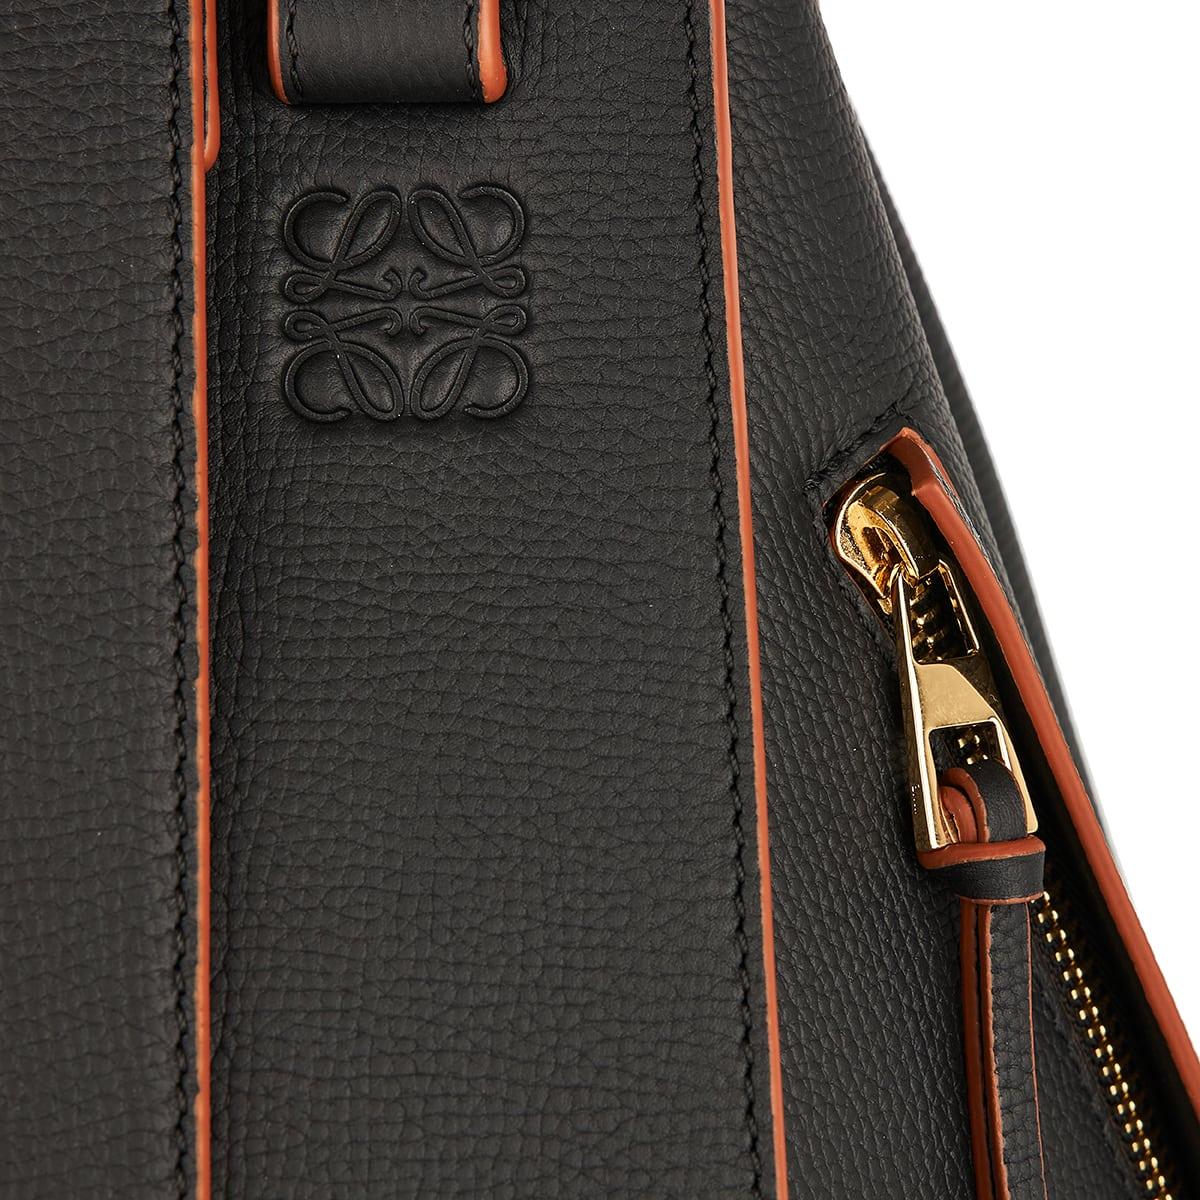 Hammock Small leather bag